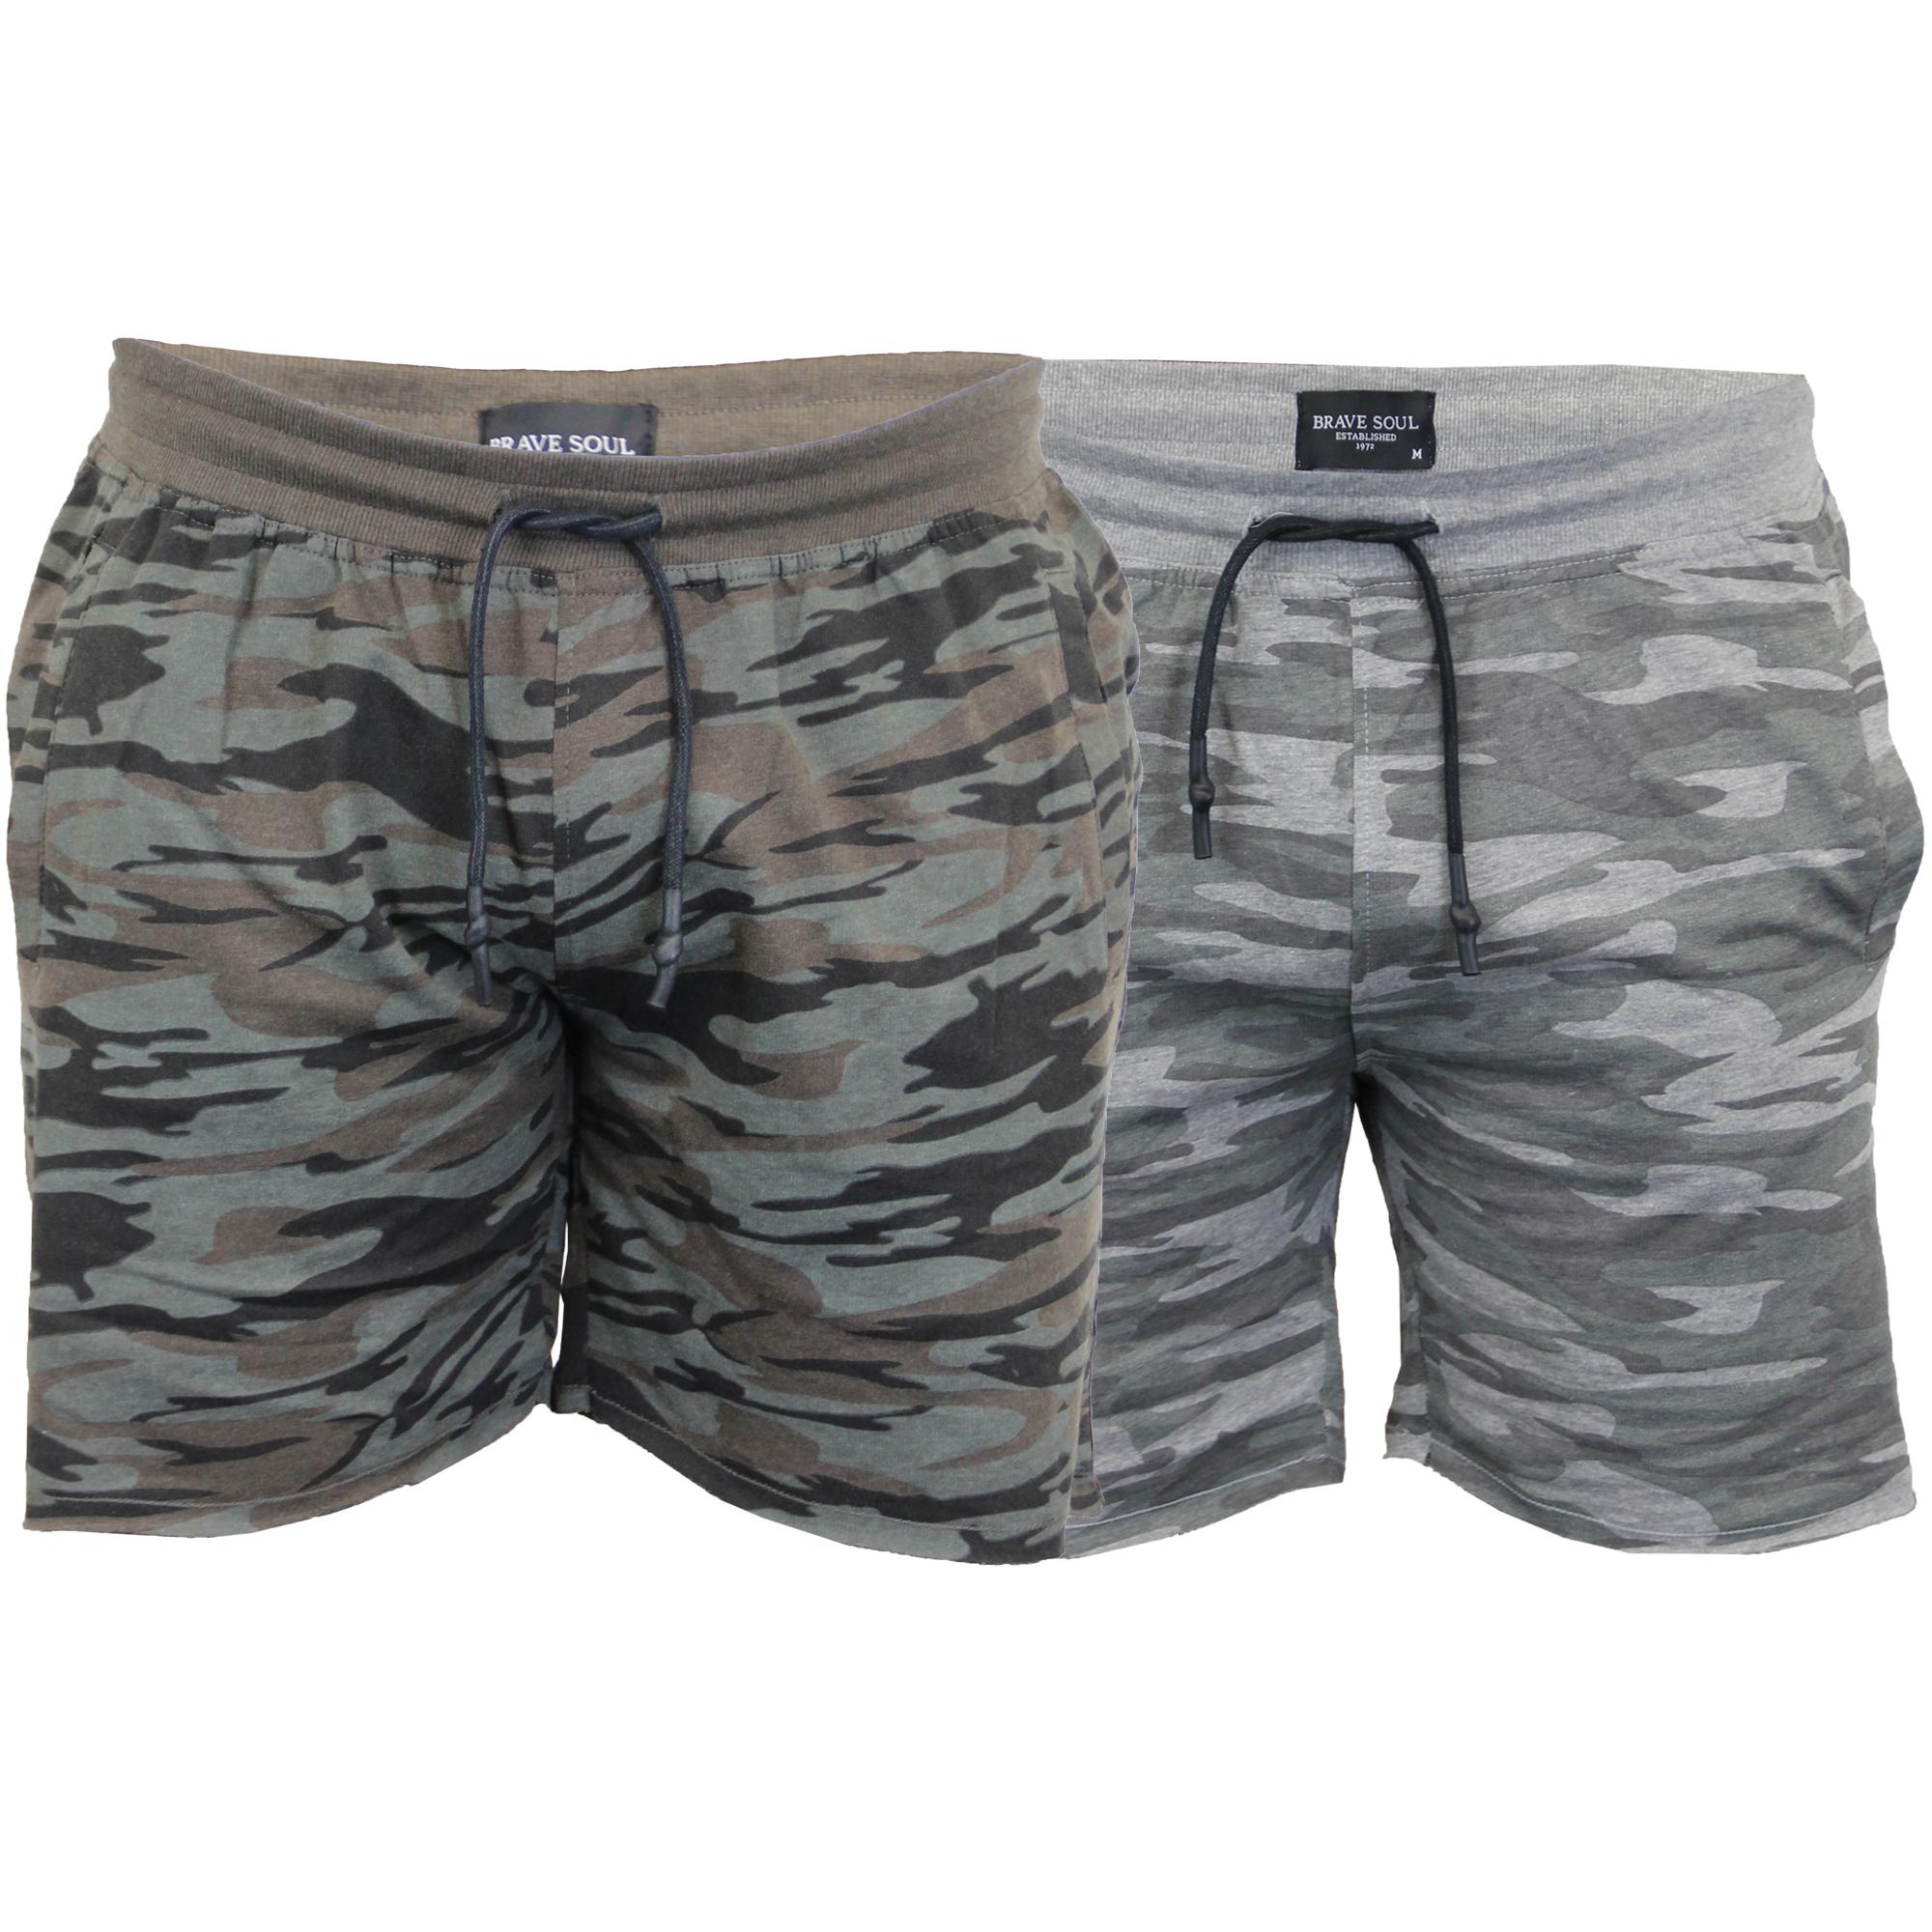 549223c4ba Mens Camo Jersey Shorts Brave Soul Crews Army Military Print ...